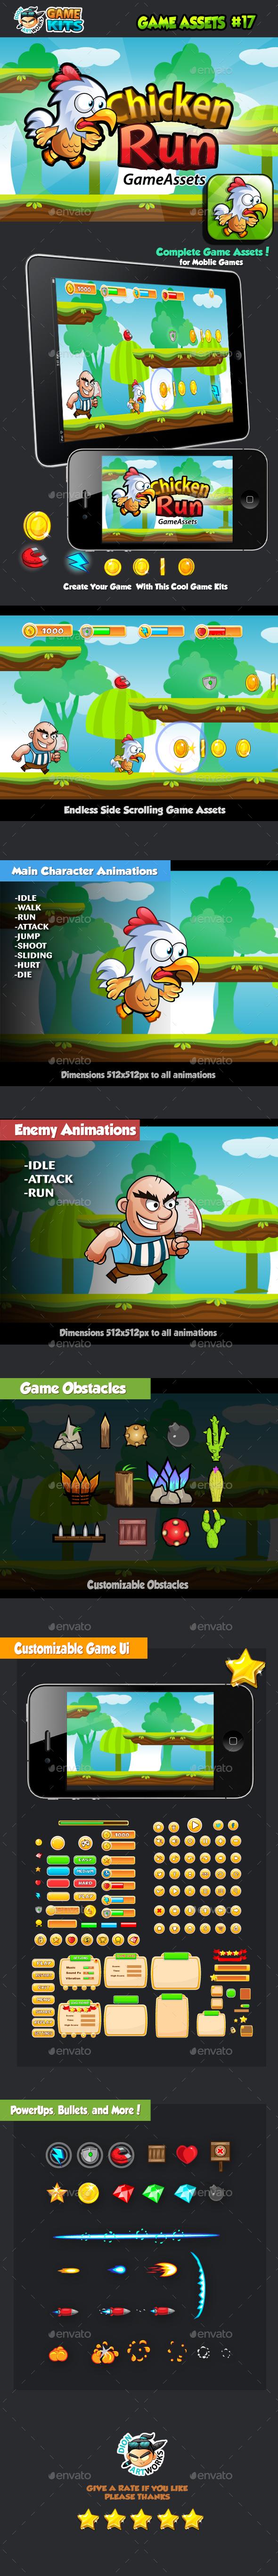 Chicken Run Platformer Game Assets 17 (Game Kits)